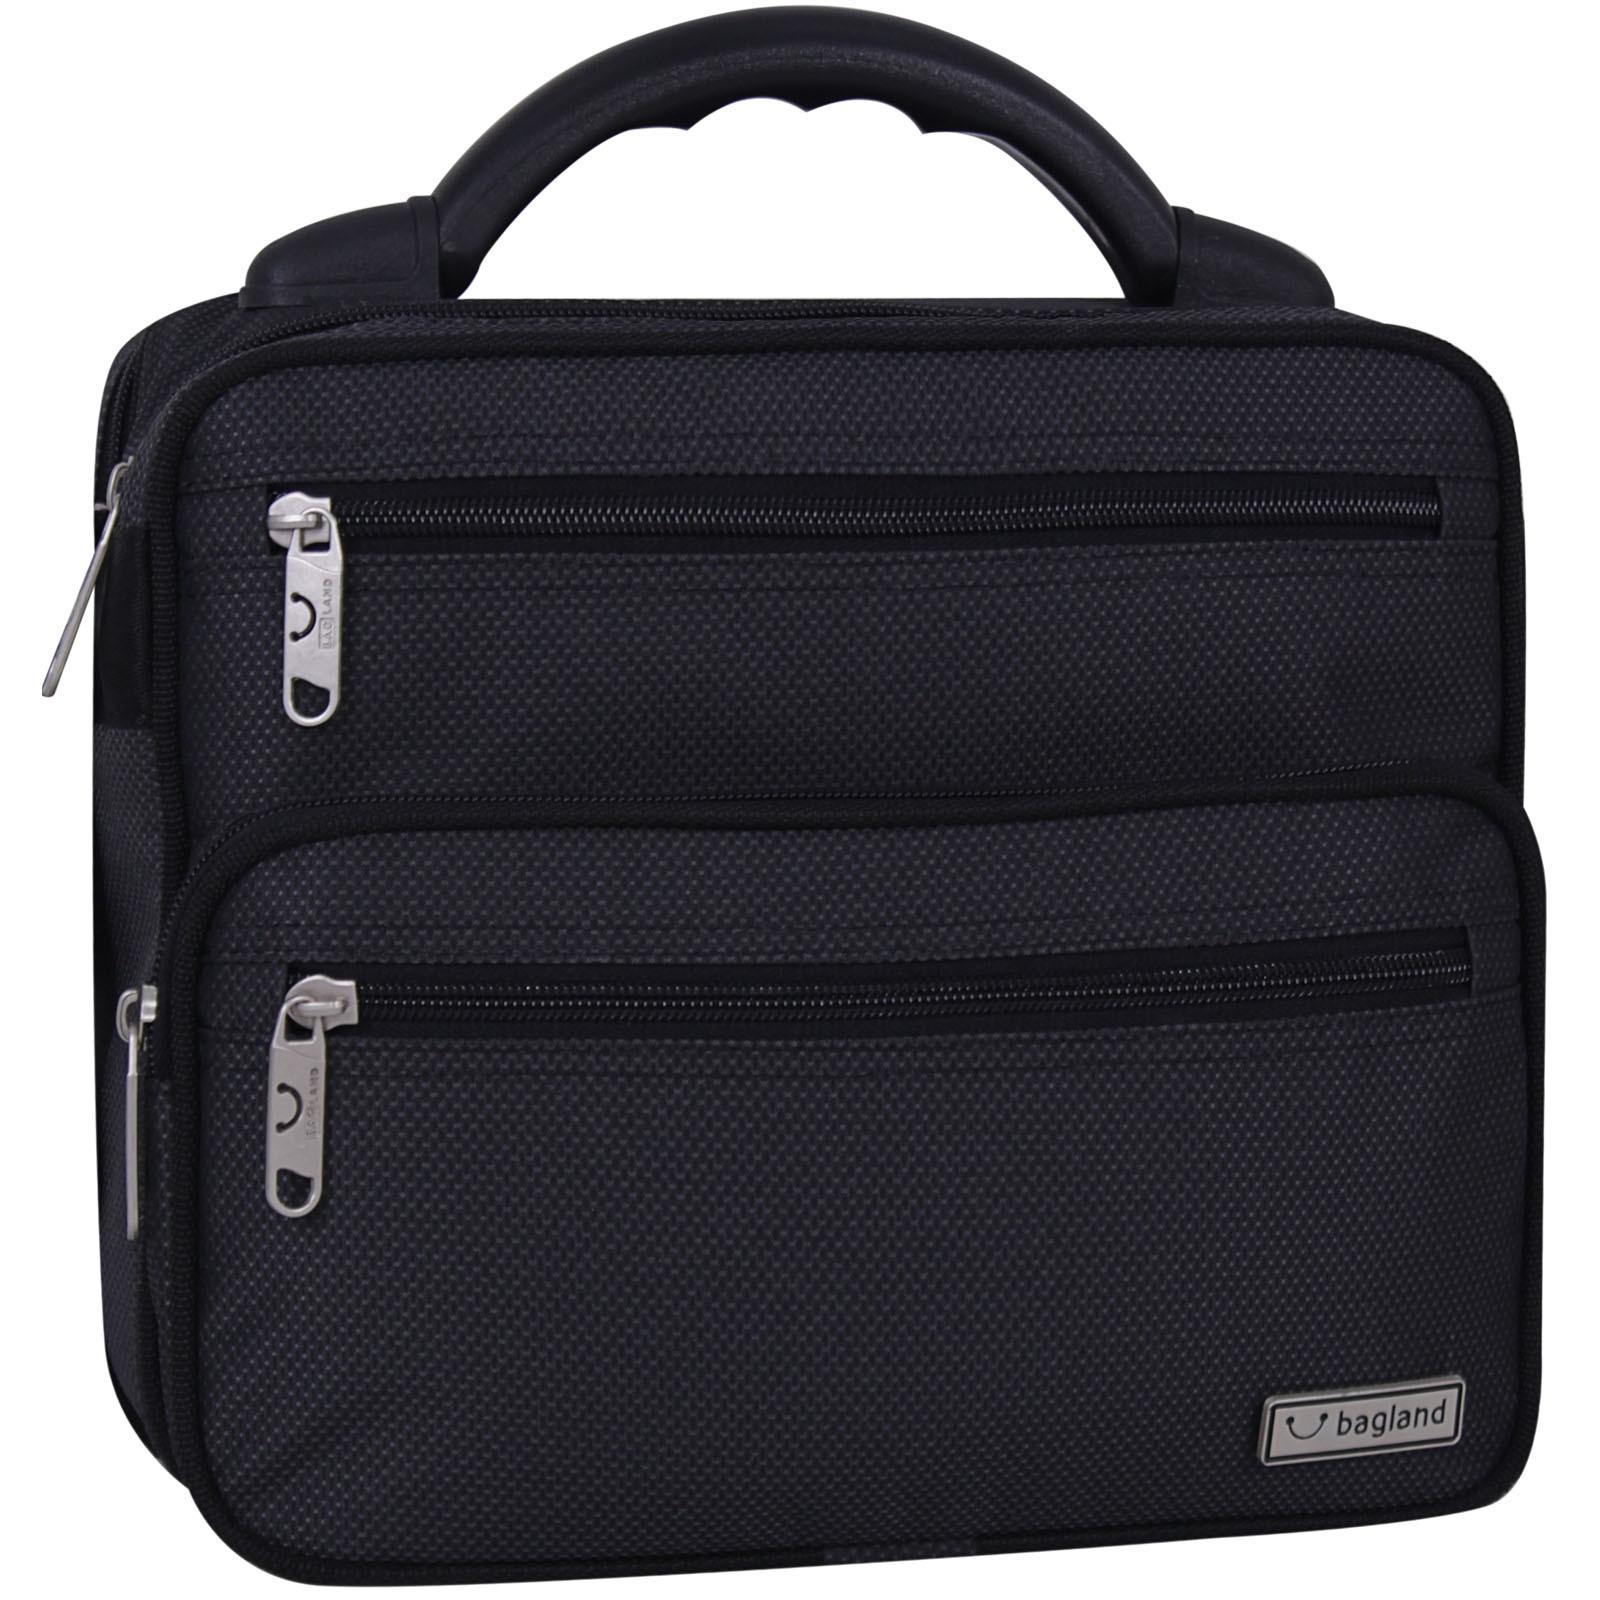 Сумки через плечо Мужская сумка Bagland Mr.Braun 8 л. Чёрный (00240169) IMG_9425-1600.jpg